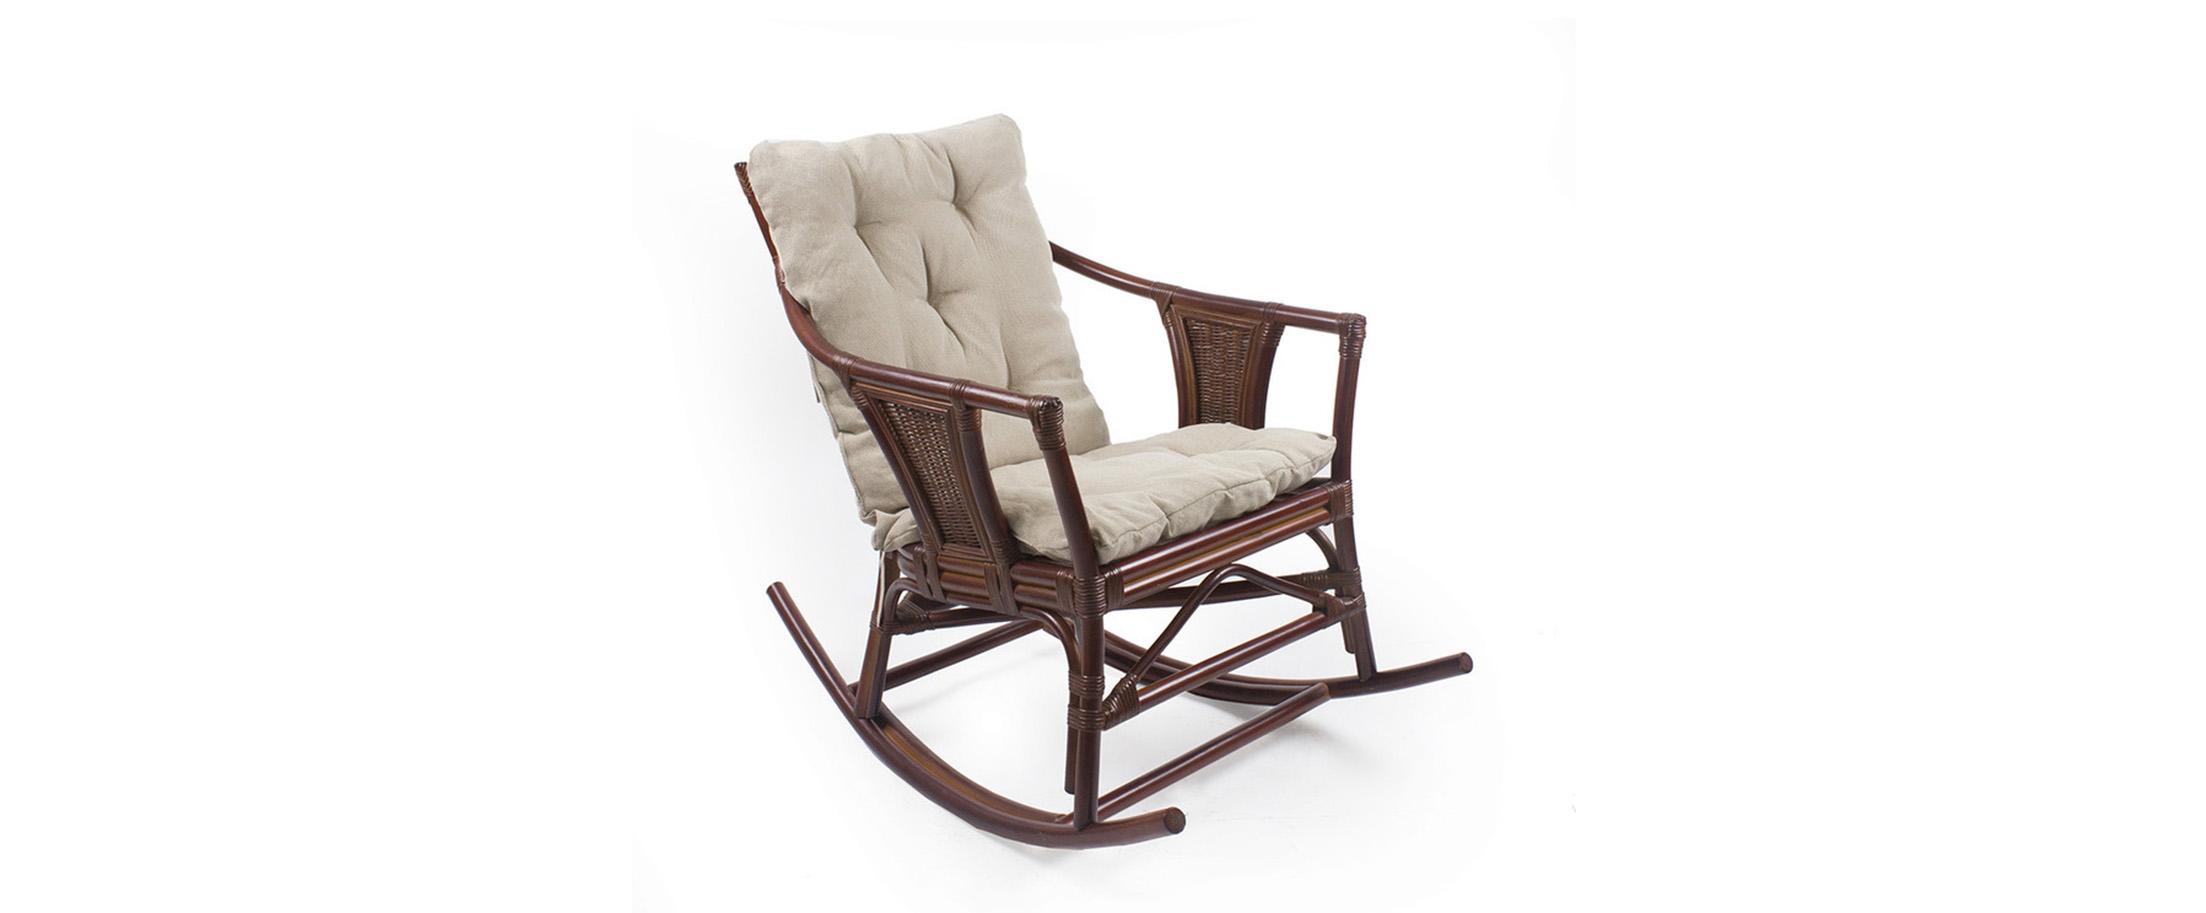 Кресло-качалка Canary Модель 364 от MOON TRADE